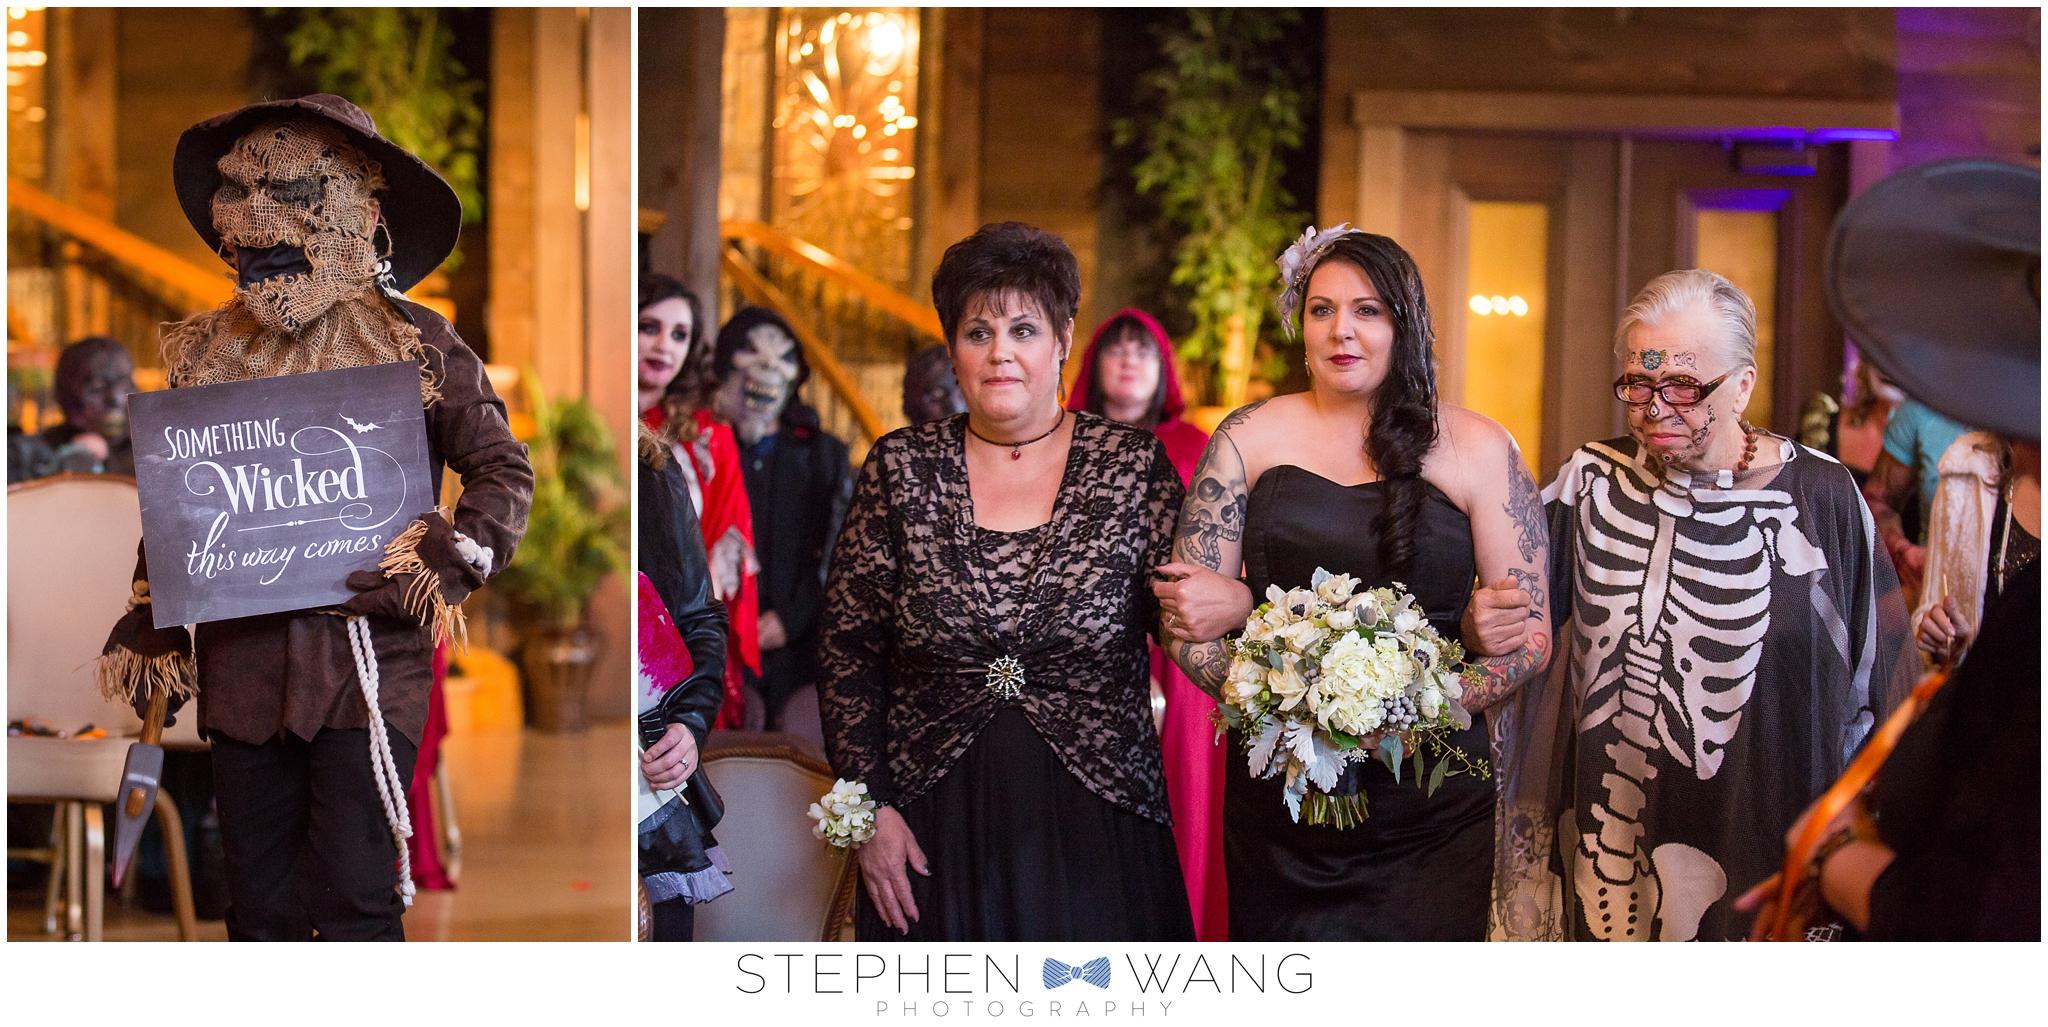 Stephen Wang Photography Wedding Connecticut CT Bill Miller's Castle Branford CT Halloween New England Wedding New Haven-12-02_0018.jpg